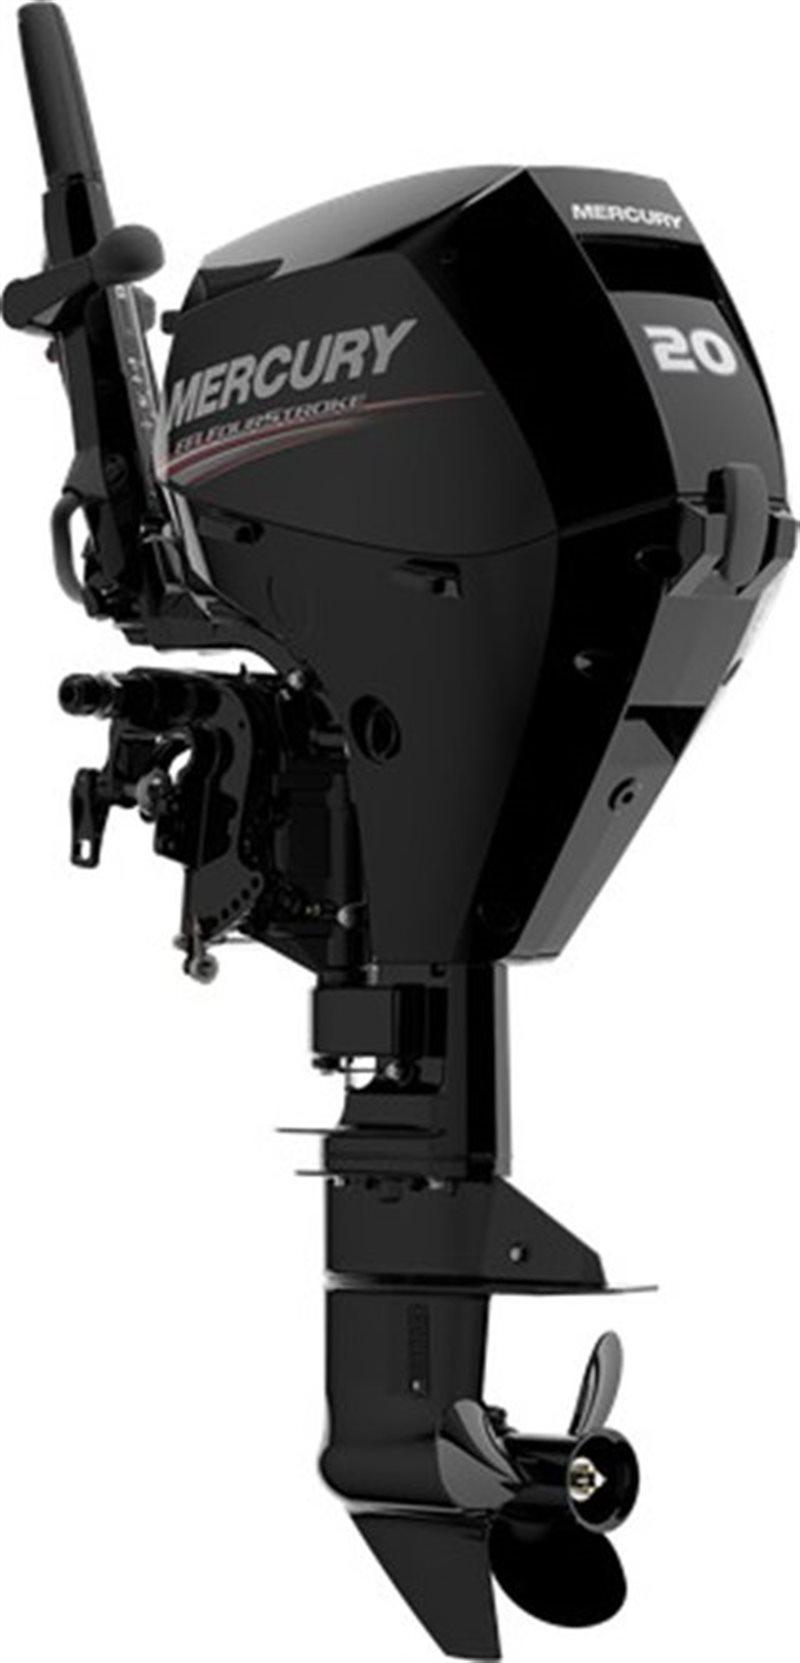 2021 Mercury Outboard FourStroke 15-20 hp 20 EFI at Pharo Marine, Waunakee, WI 53597